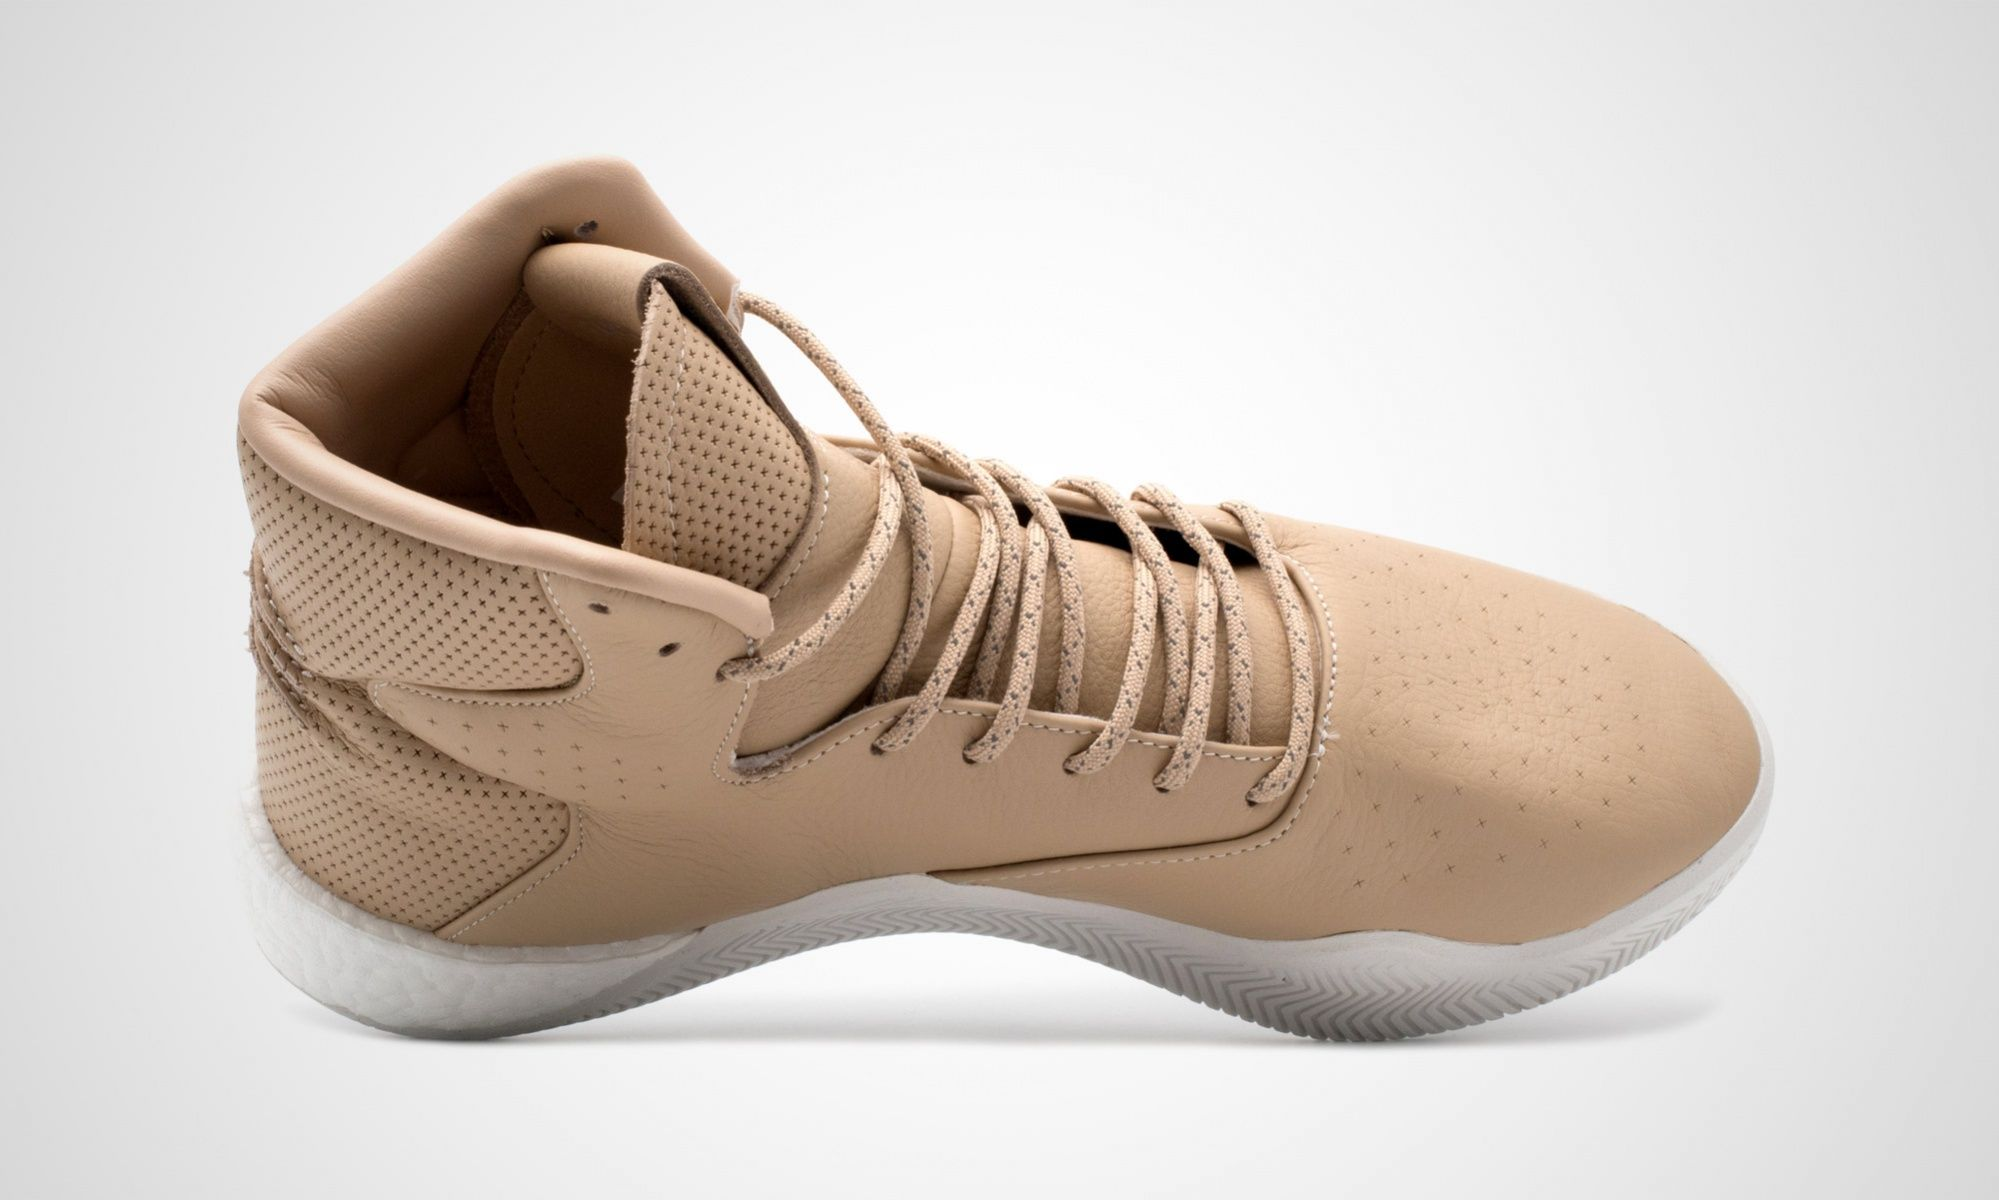 00358ffac461 adidas Tubular Instict Boost (hellbraun) - BB8400   43einhalb sneaker store